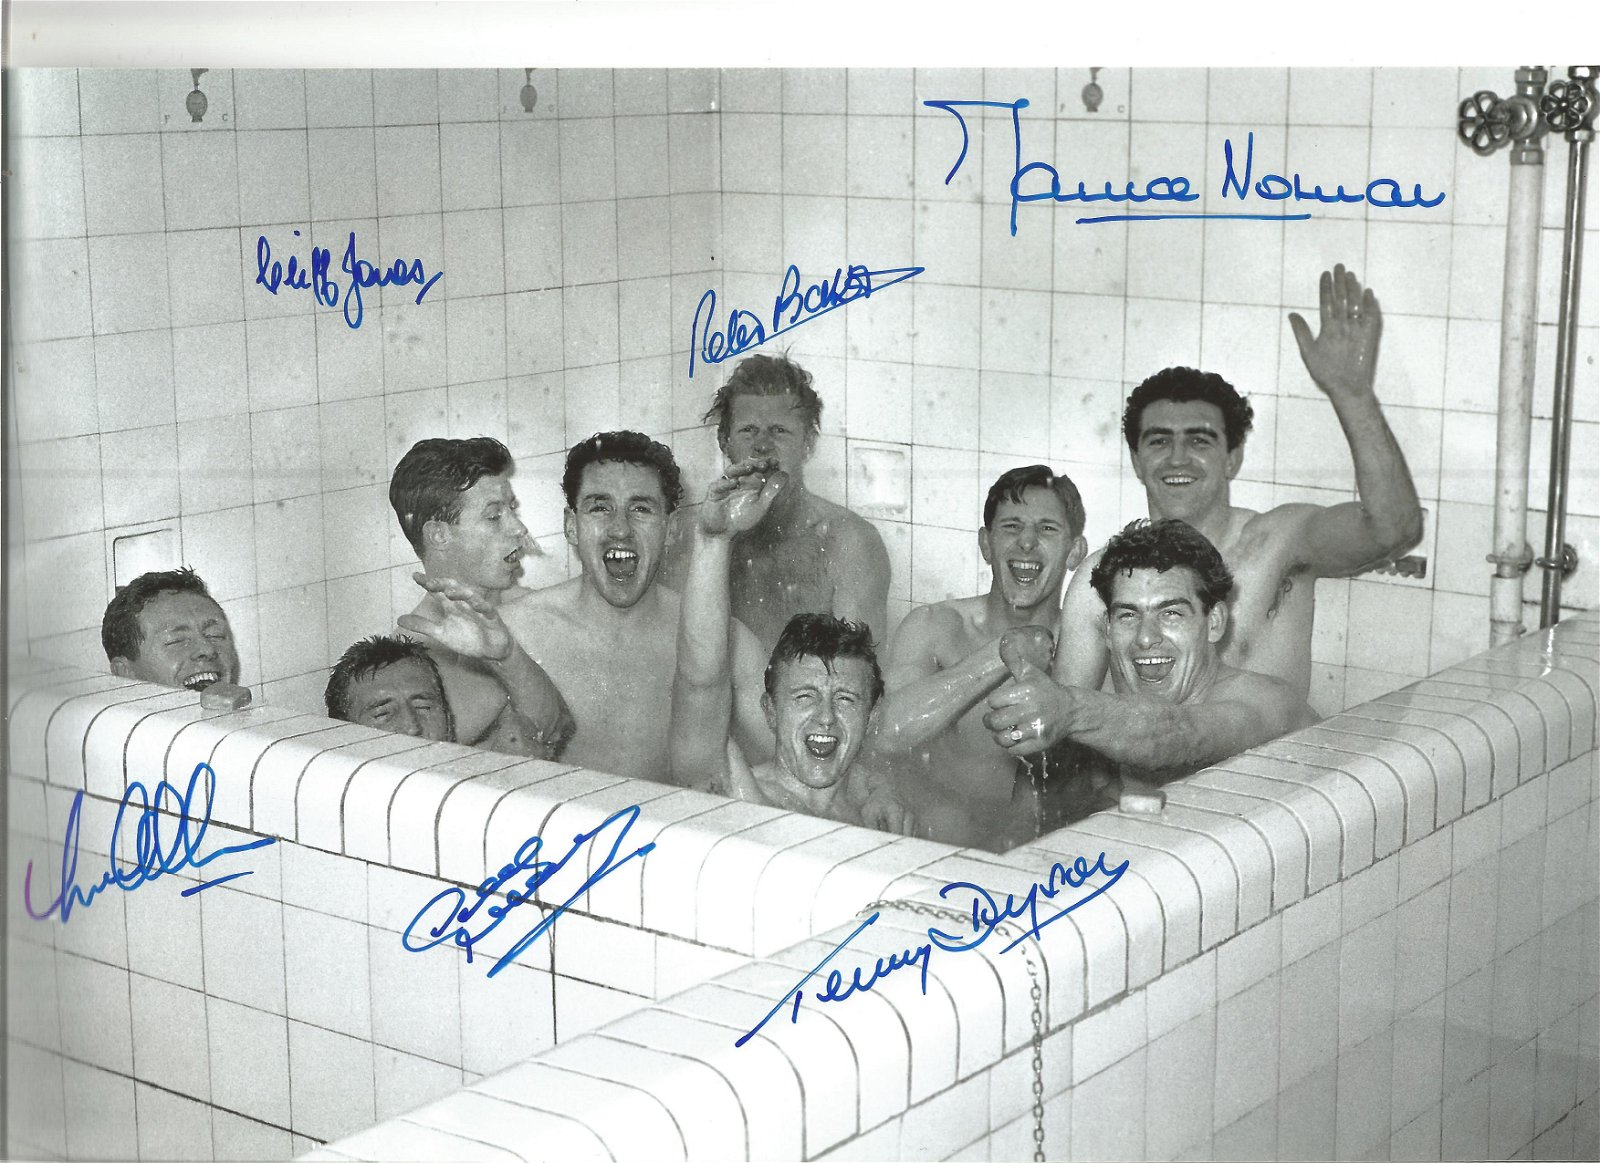 Tottenham 1961 Football Autographed 12 X 8 Photo, A